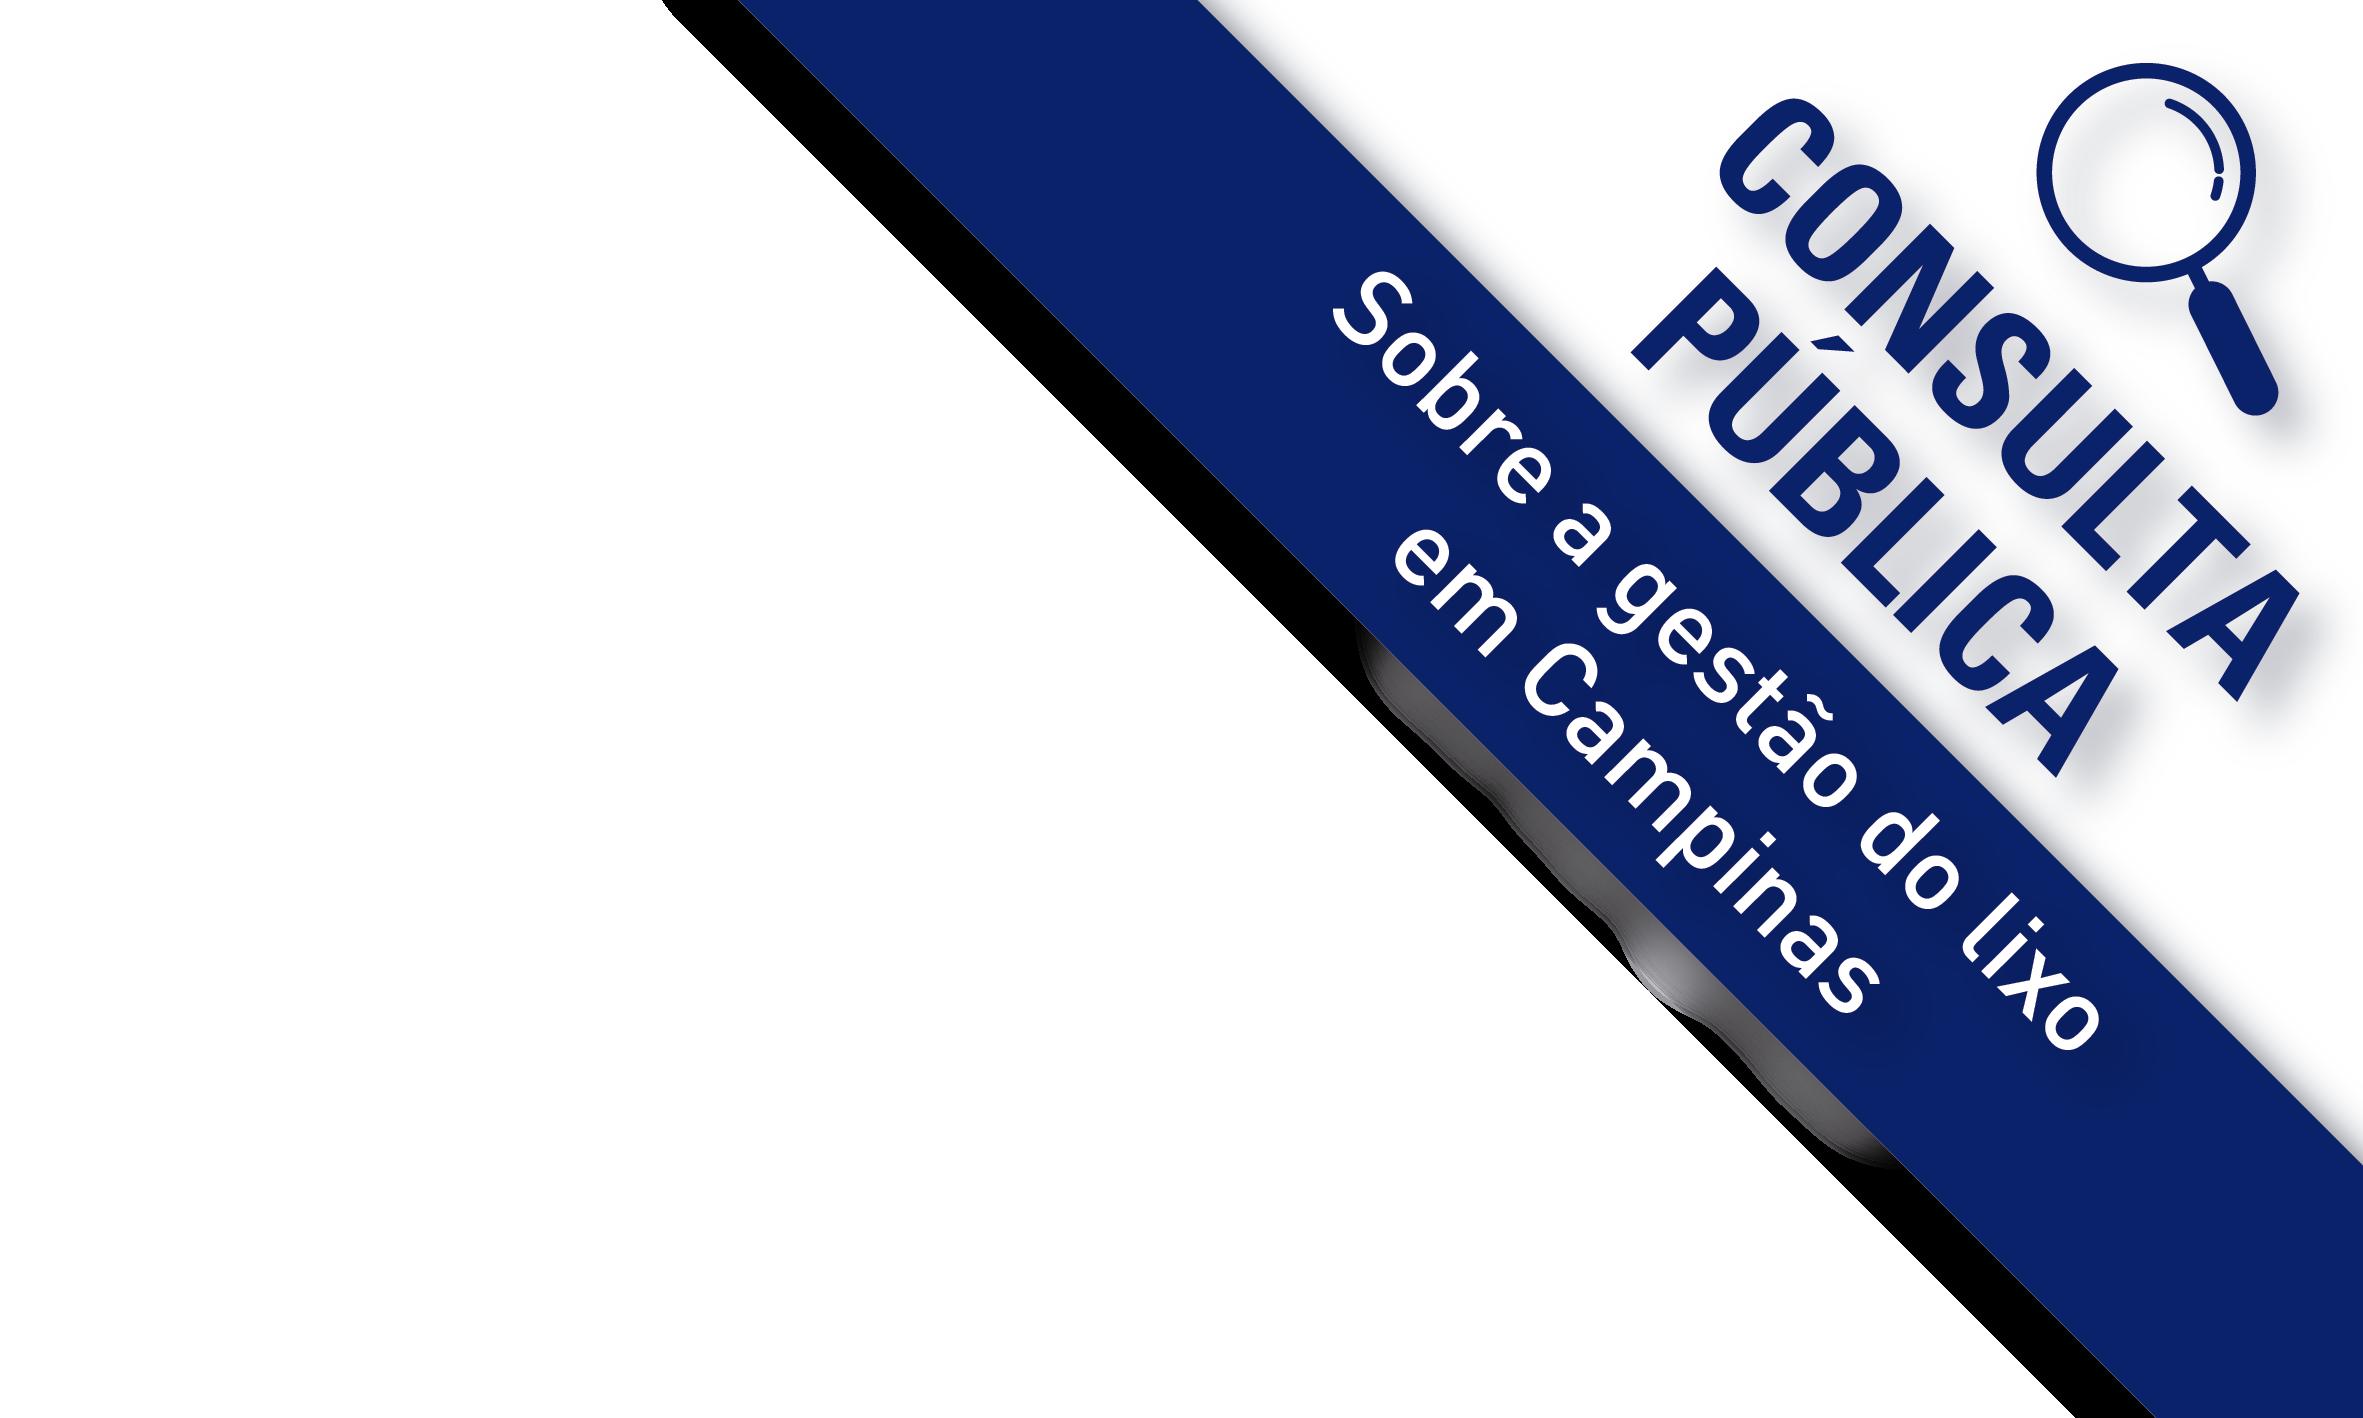 selo promocional - http://campinas.sp.gov.br/governo/servicos-publicos/sistema-integrado-limpeza-publica.php